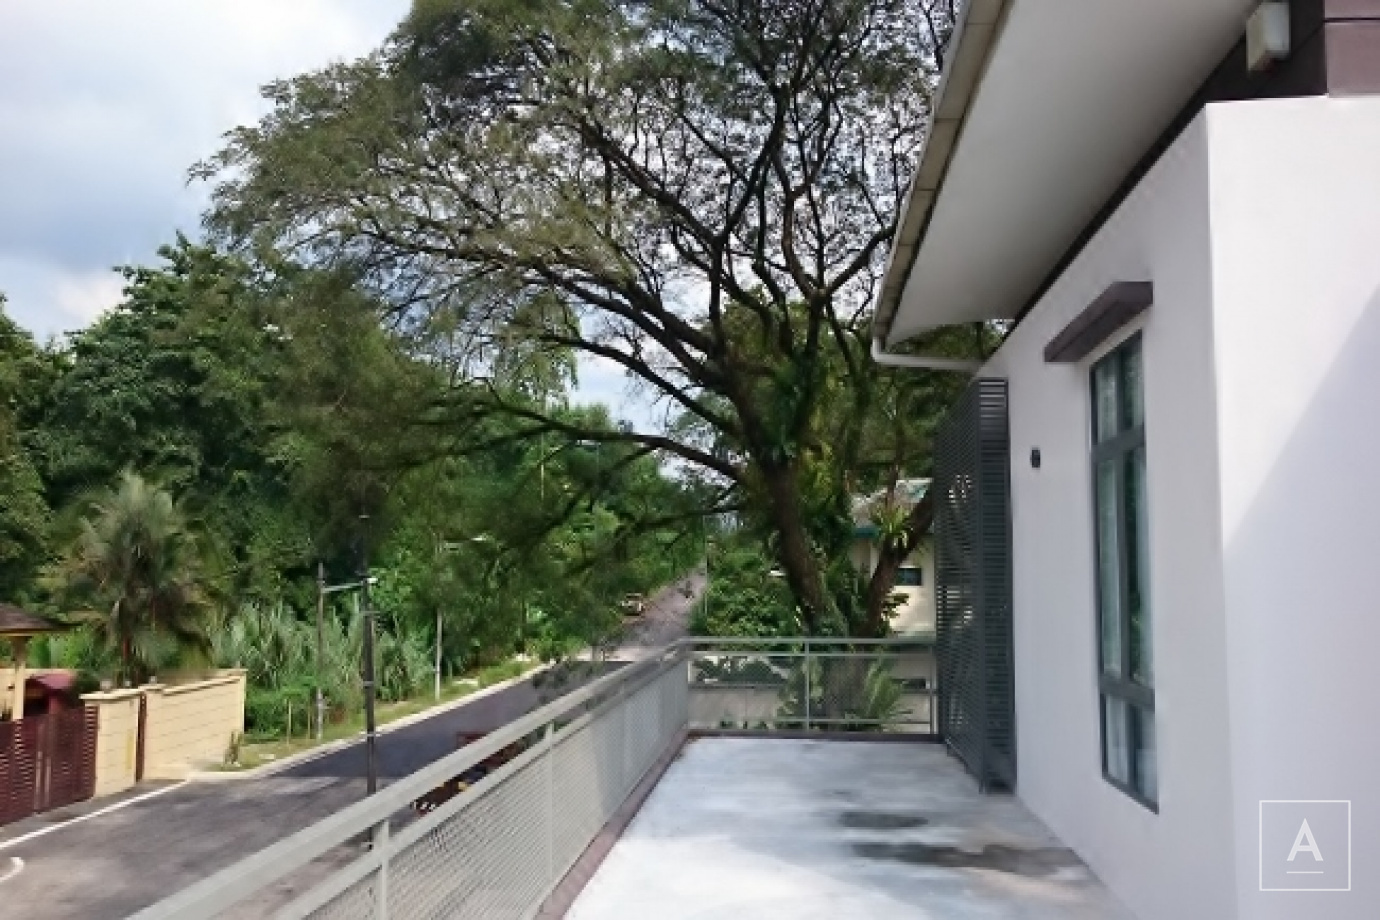 Taman Tiara Titiwangsa,Kuala Lumpur, 5 Bedrooms Bedrooms, ,5 BathroomsBathrooms,Bungalow / Detached,For Sale,Titiwangsa,1242